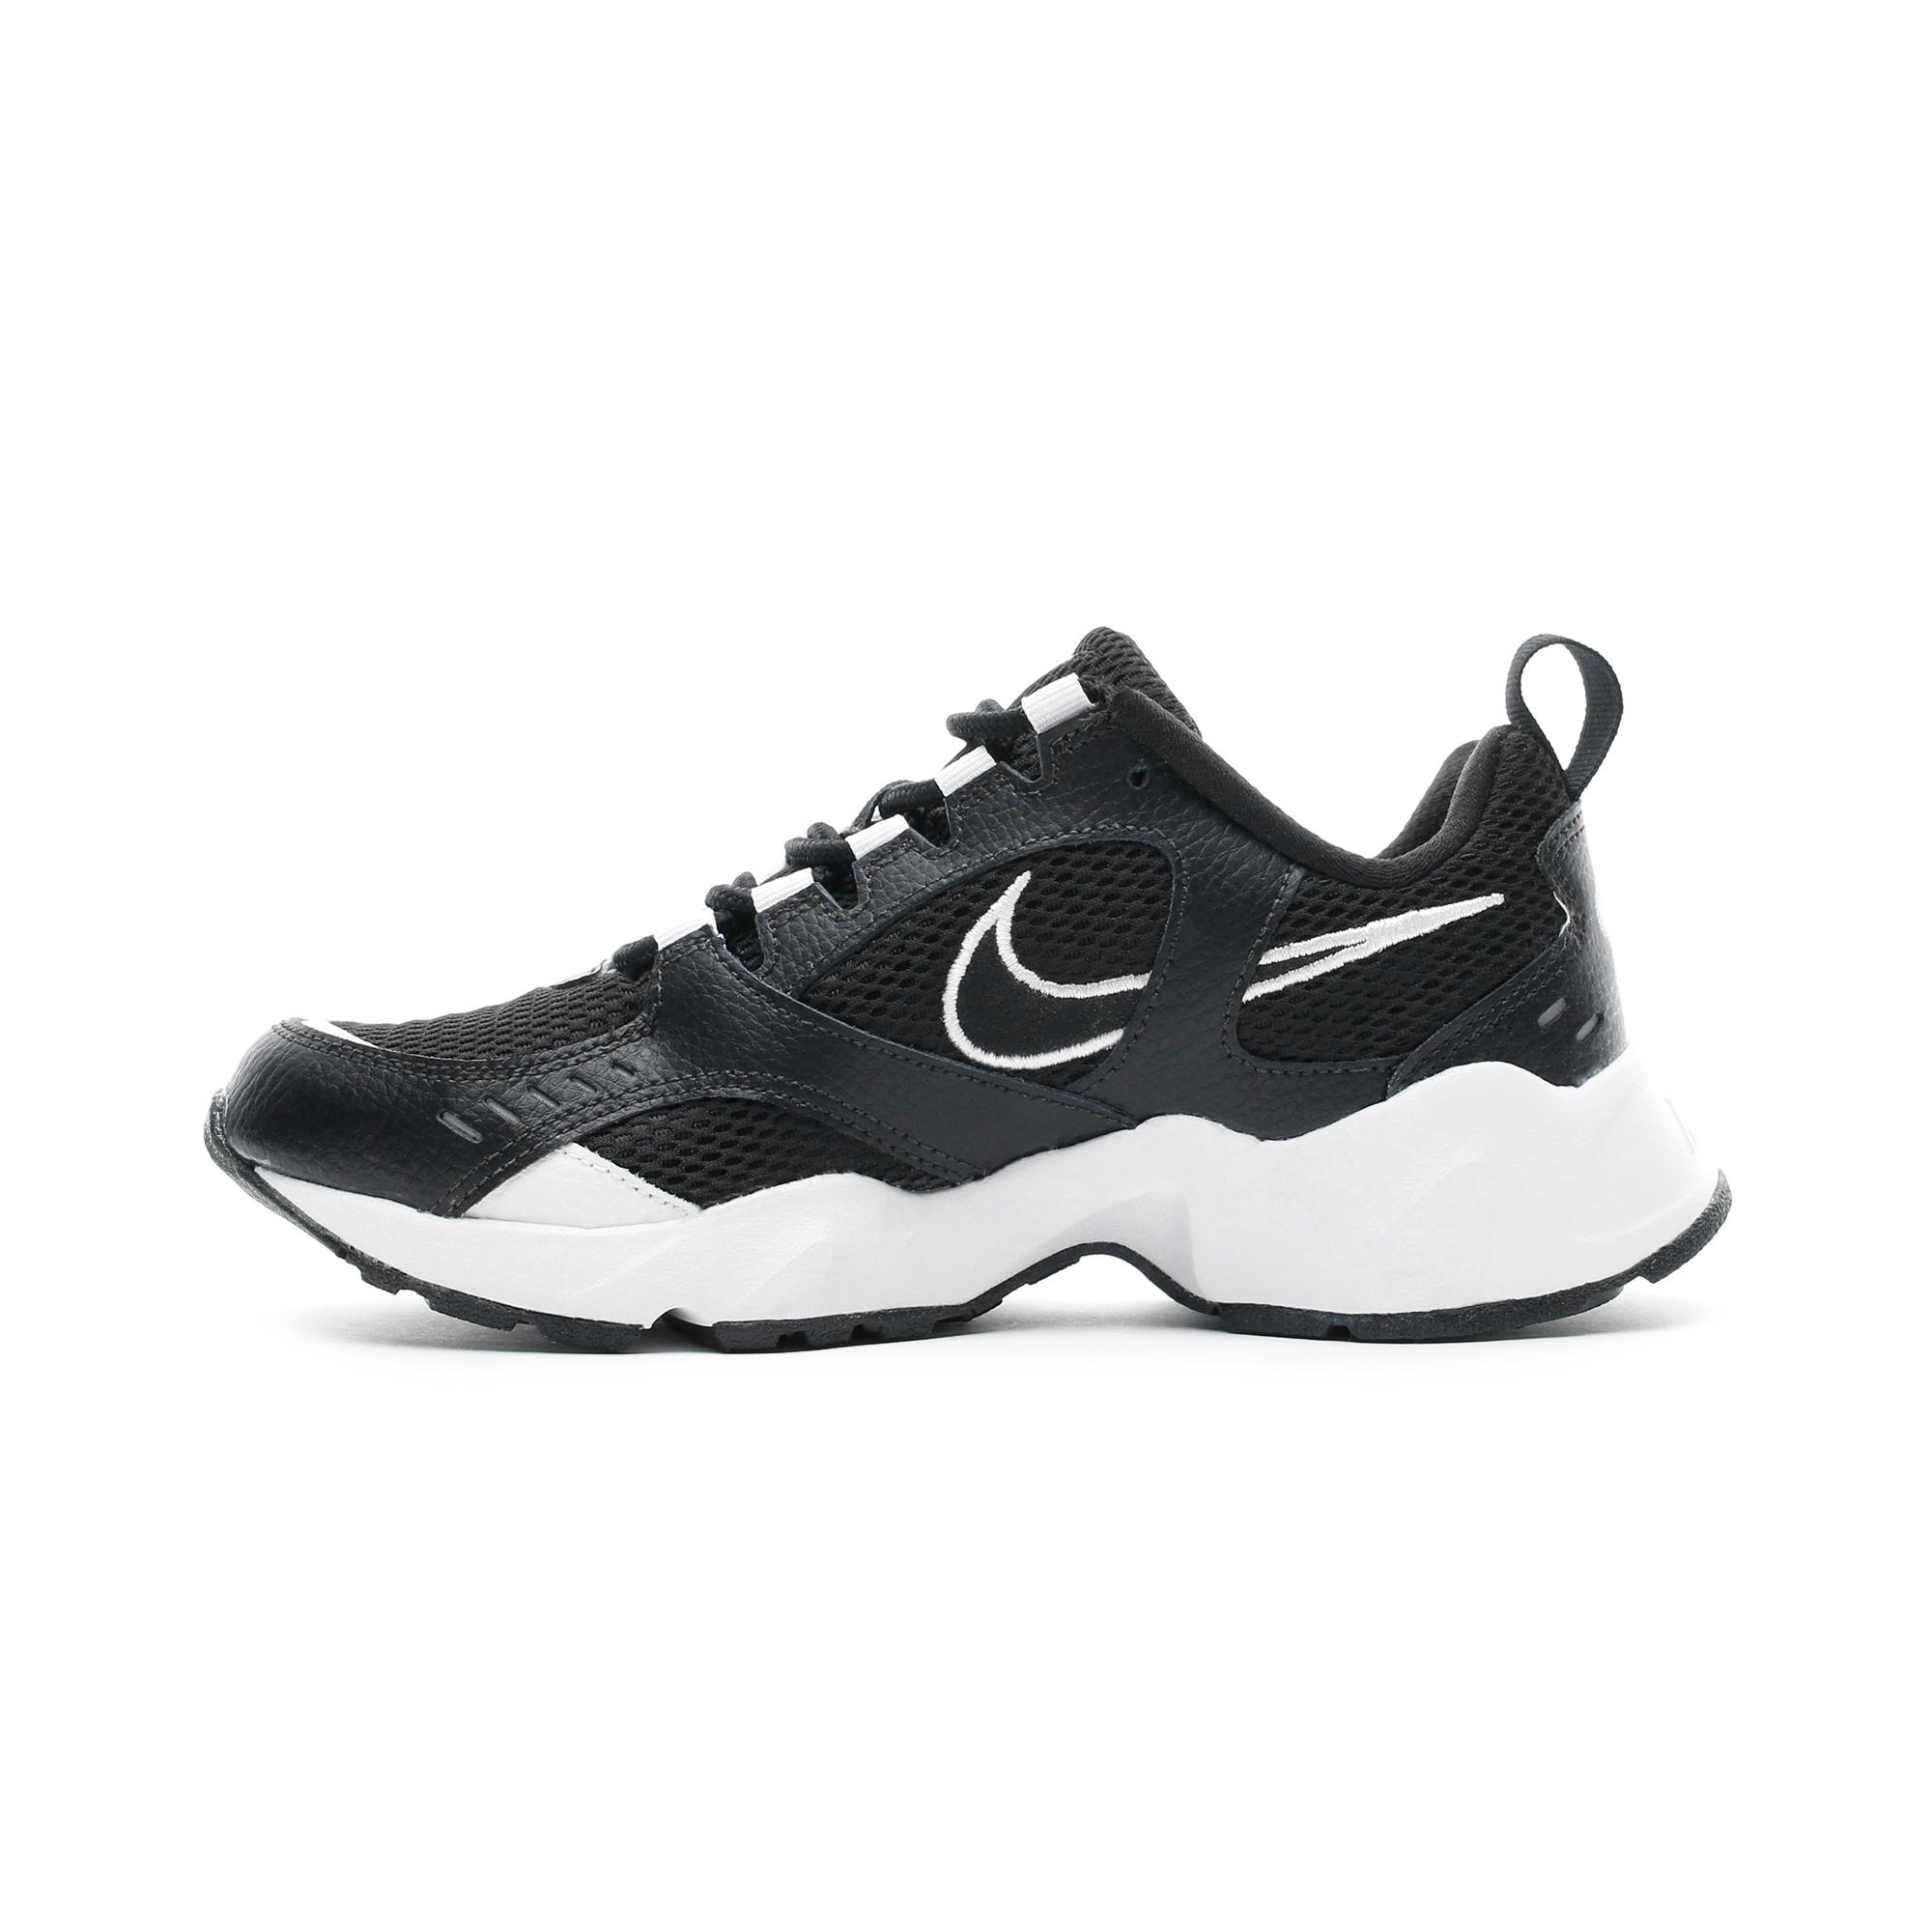 Nike Air Heights Siyah Kadın Spor Ayakkabı